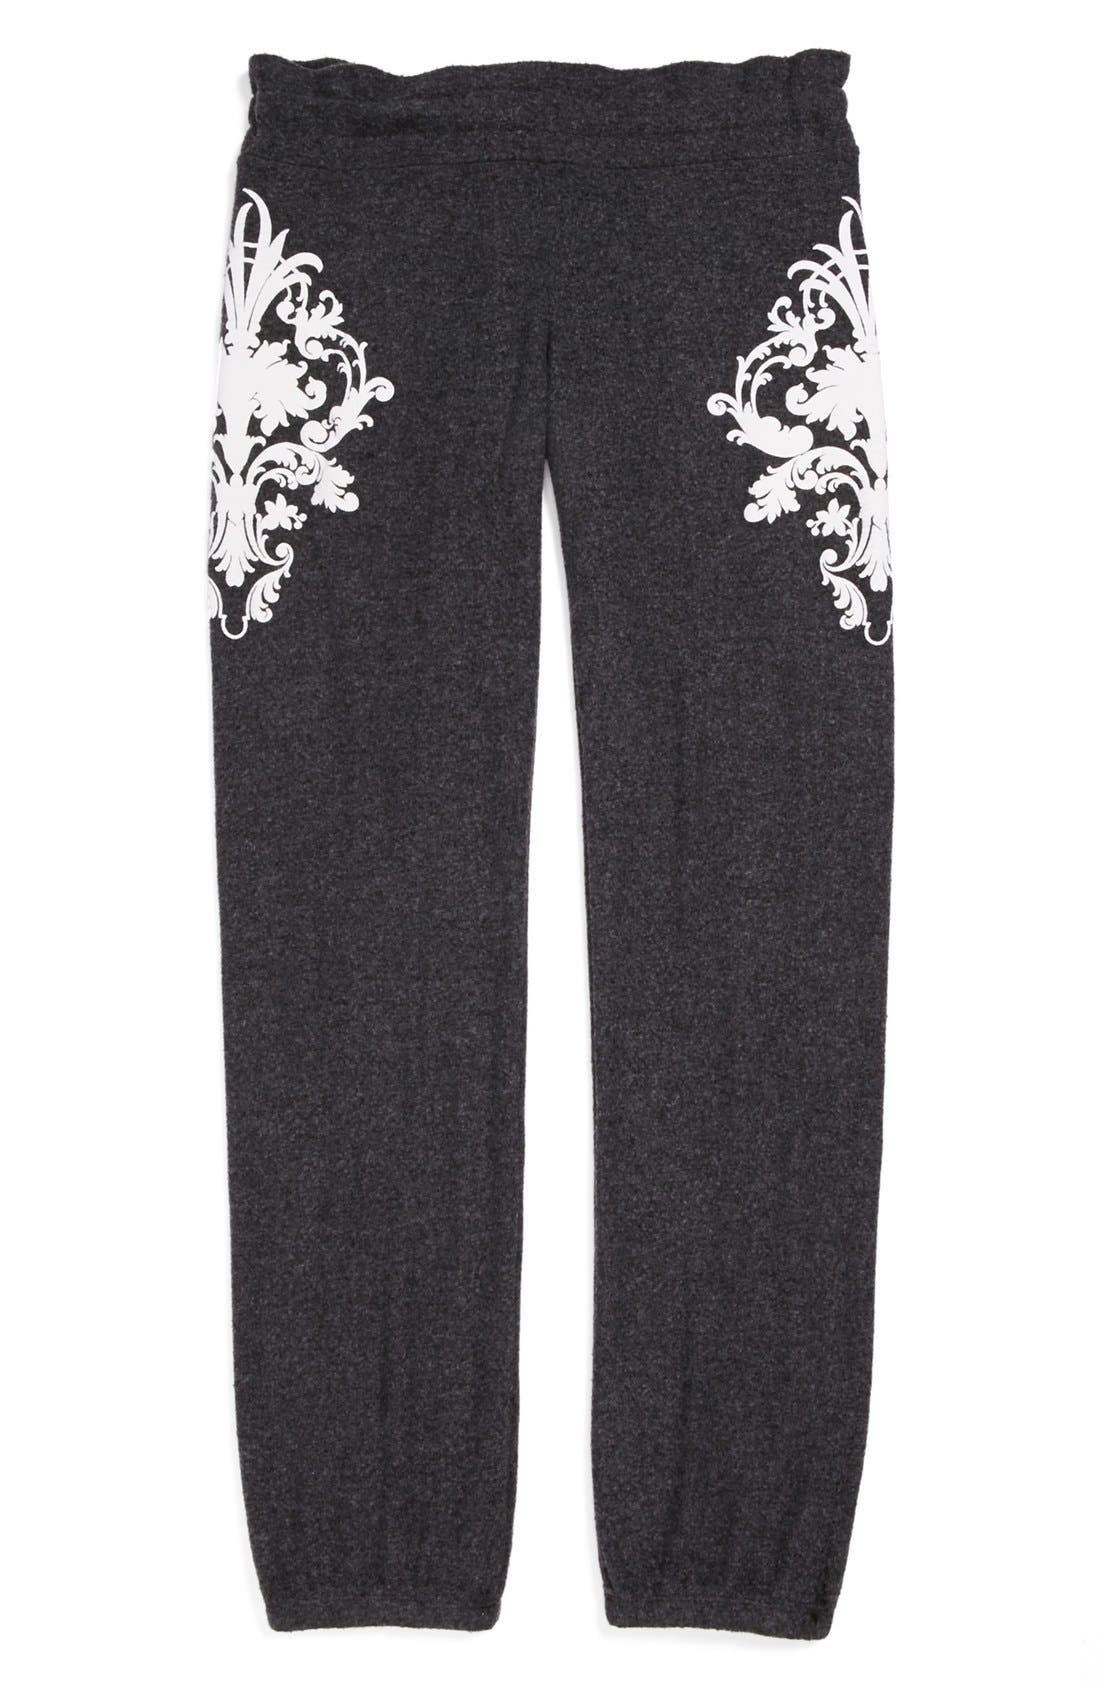 Alternate Image 1 Selected - Wildfox 'Summer Night' Pants (Big Girls)